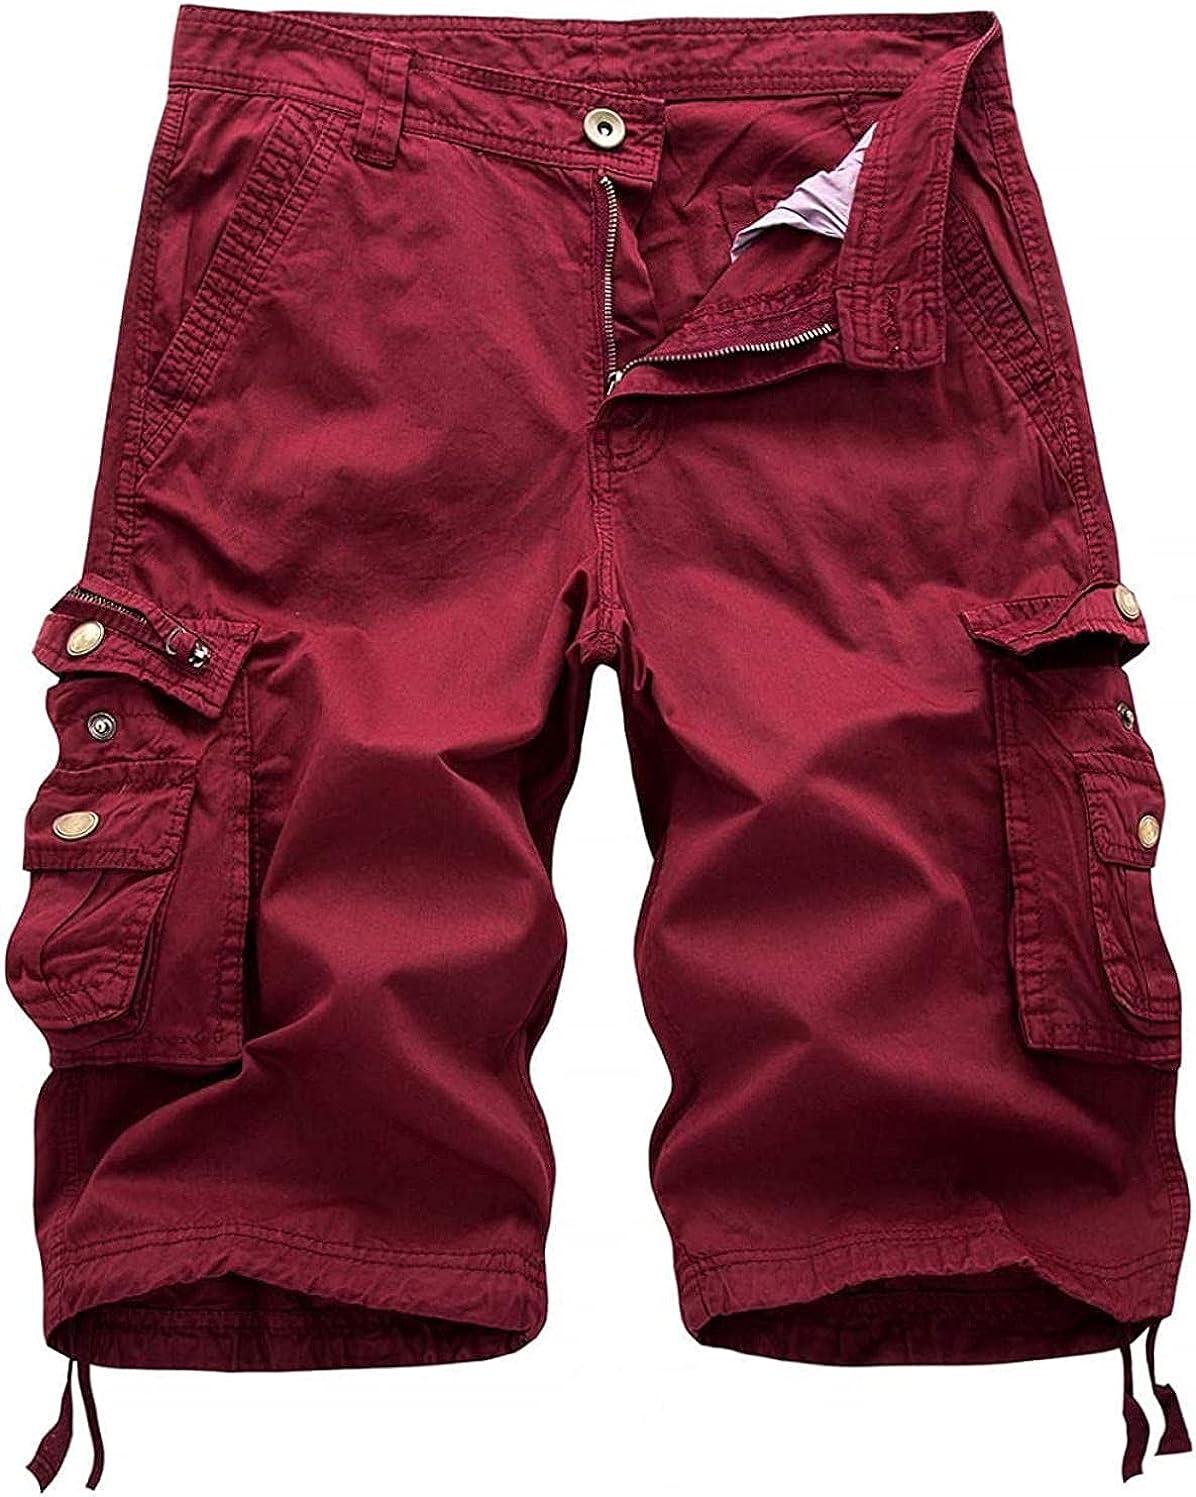 HFStorry Men's Comfy Natural Waist Straight Leg Knee-Length Bermuda Work Cargo Shorts Wine Red